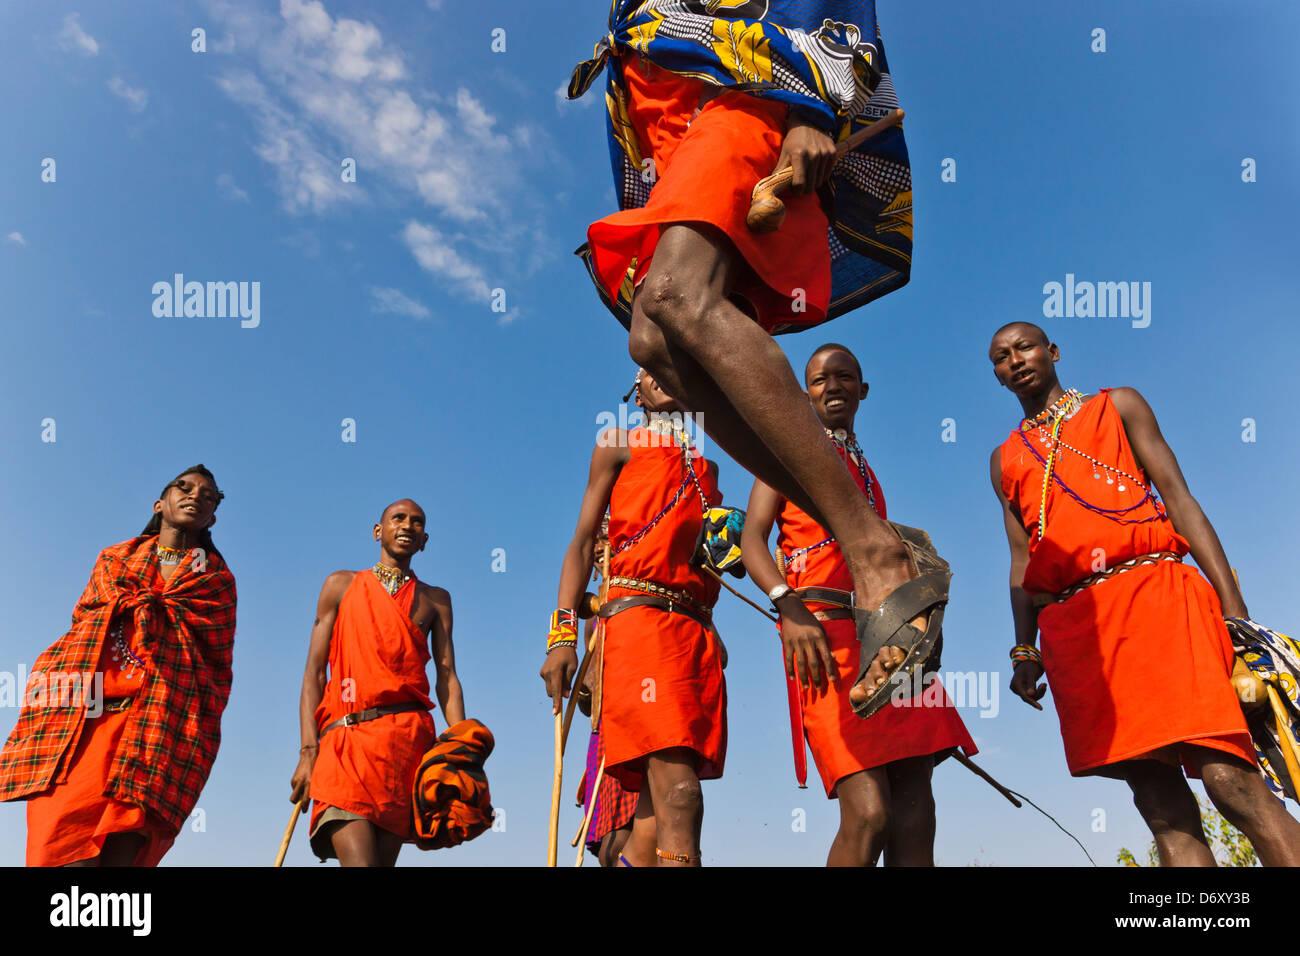 Les tribus Masai saut de la scène dance, Masai Mara, Kenya Photo Stock